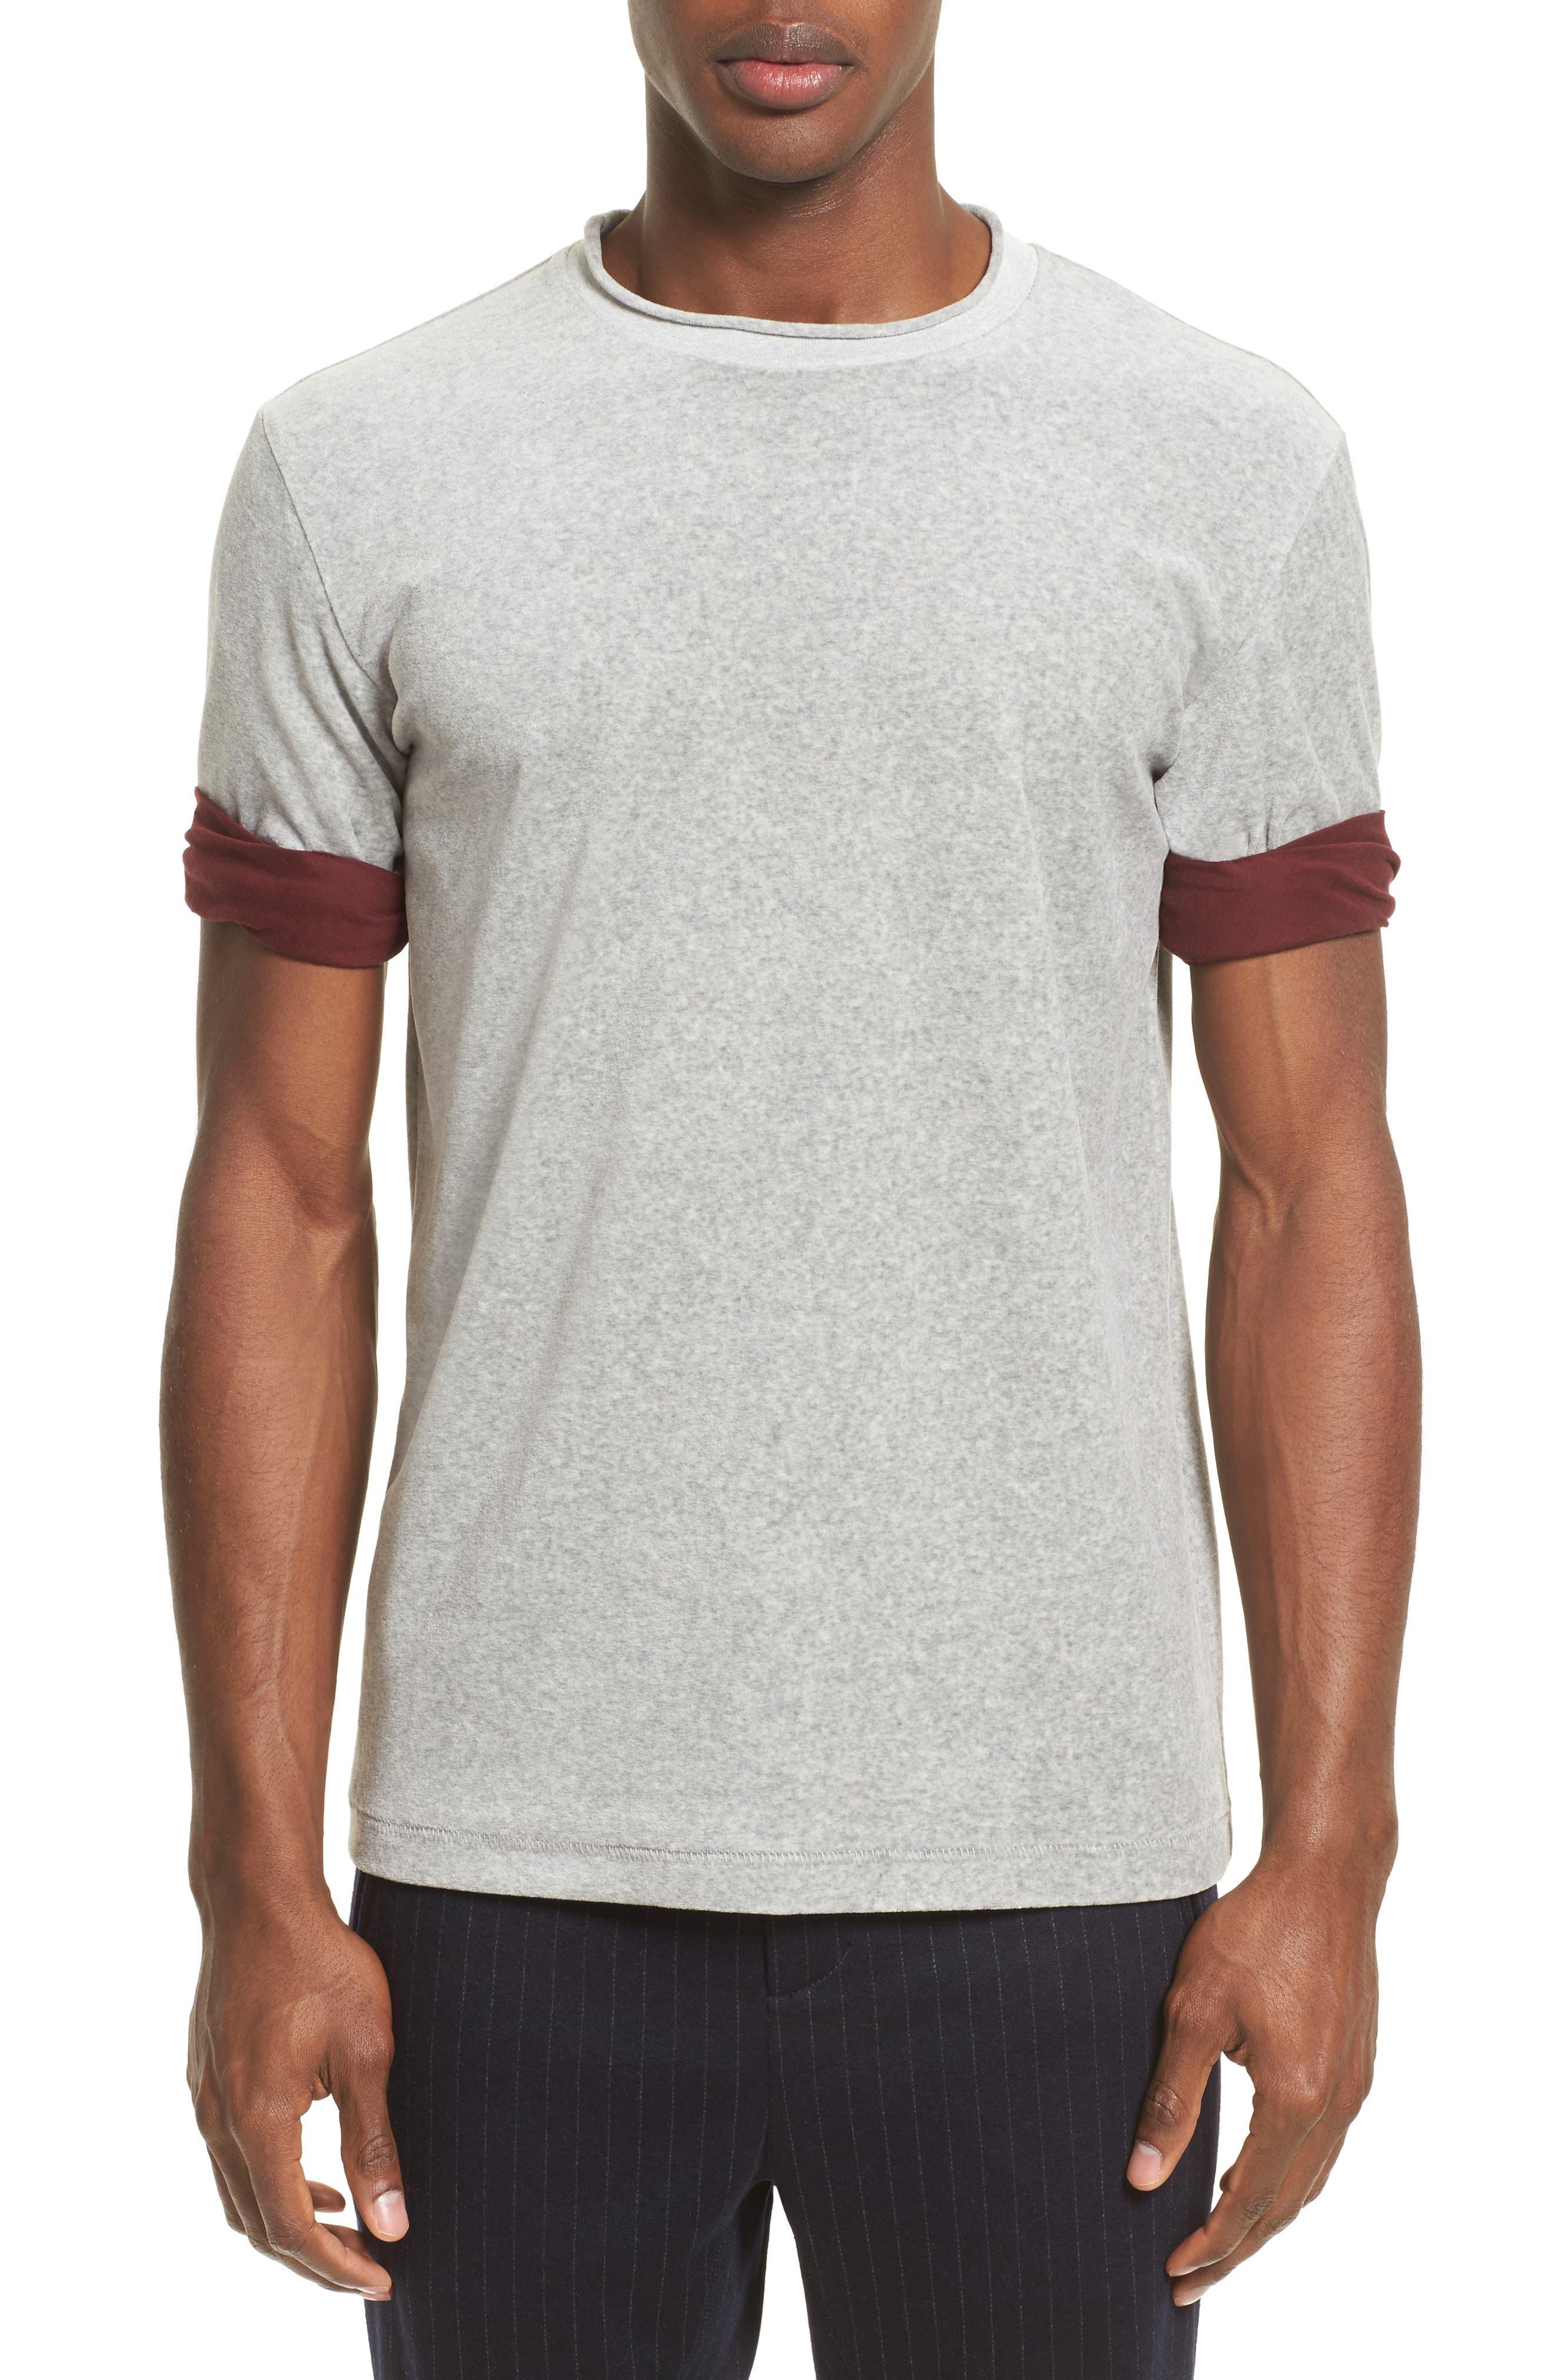 Alternate Image 1 Selected - 3.1 Phillip Lim Velour Crewneck T-Shirt